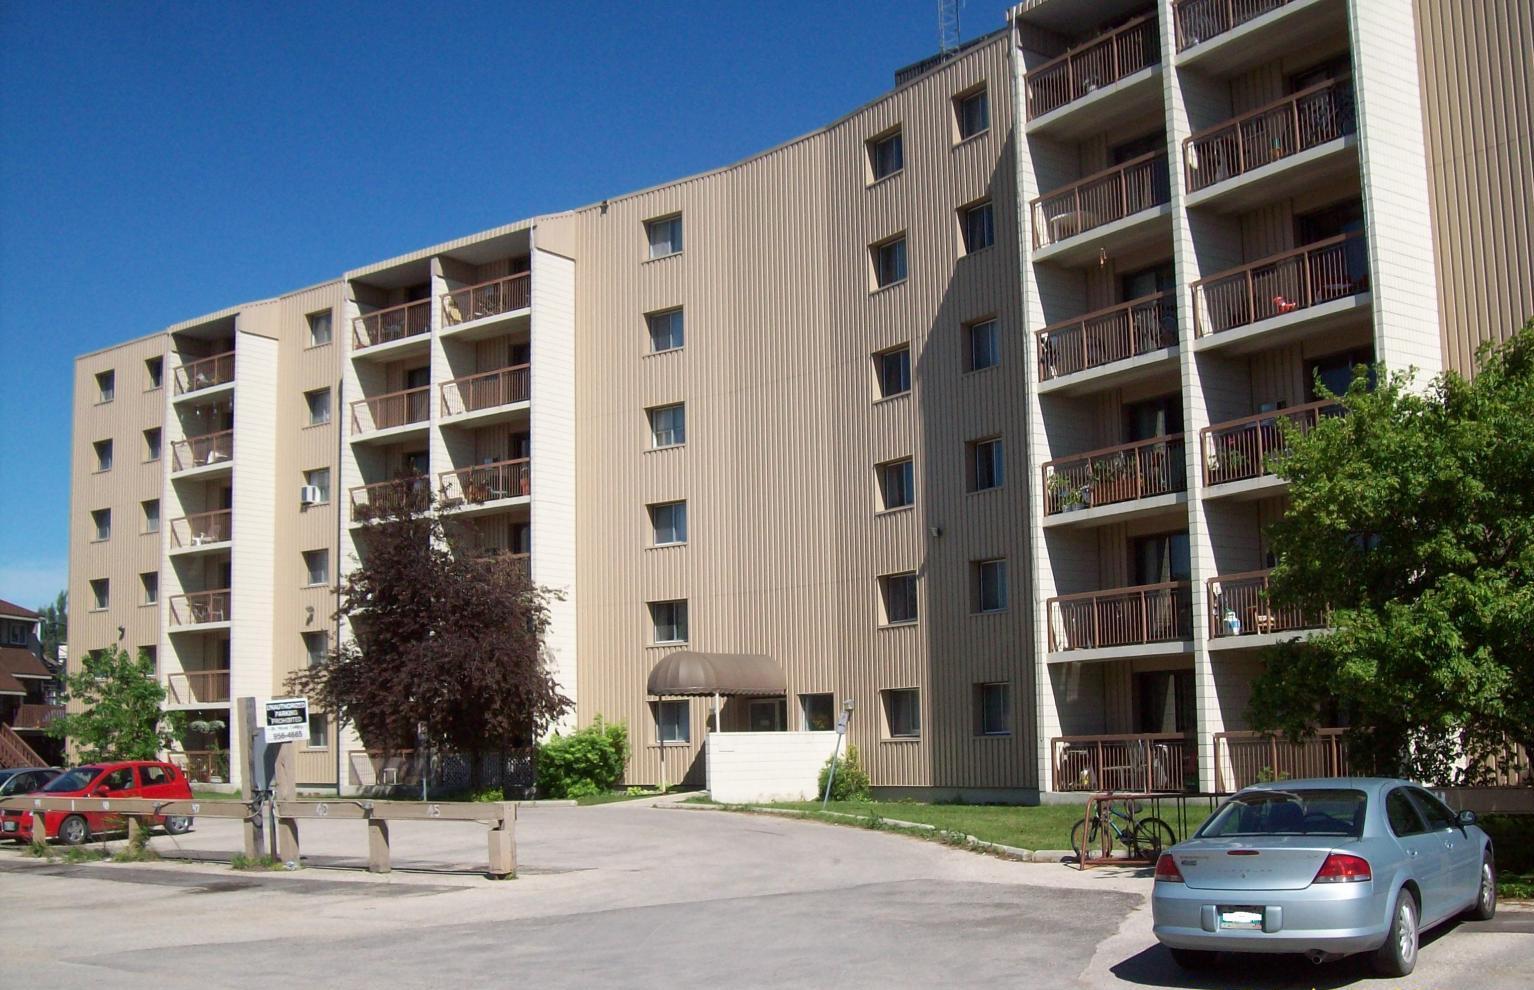 3233 Silver Avenue, Winnipeg, is For Rent | Rentals.ca